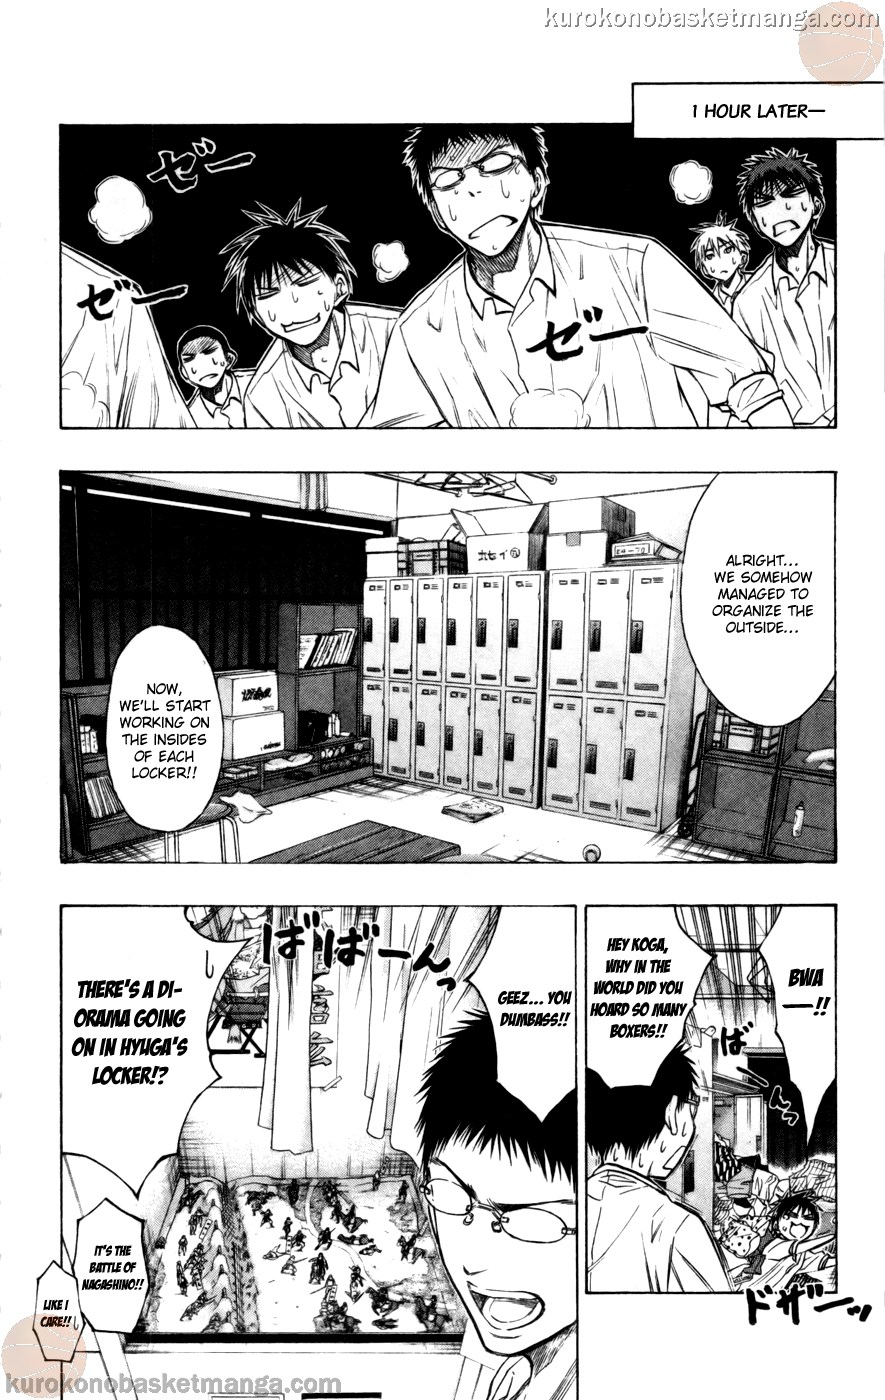 Kuroko no Basket Manga Chapter 94 - Image 10